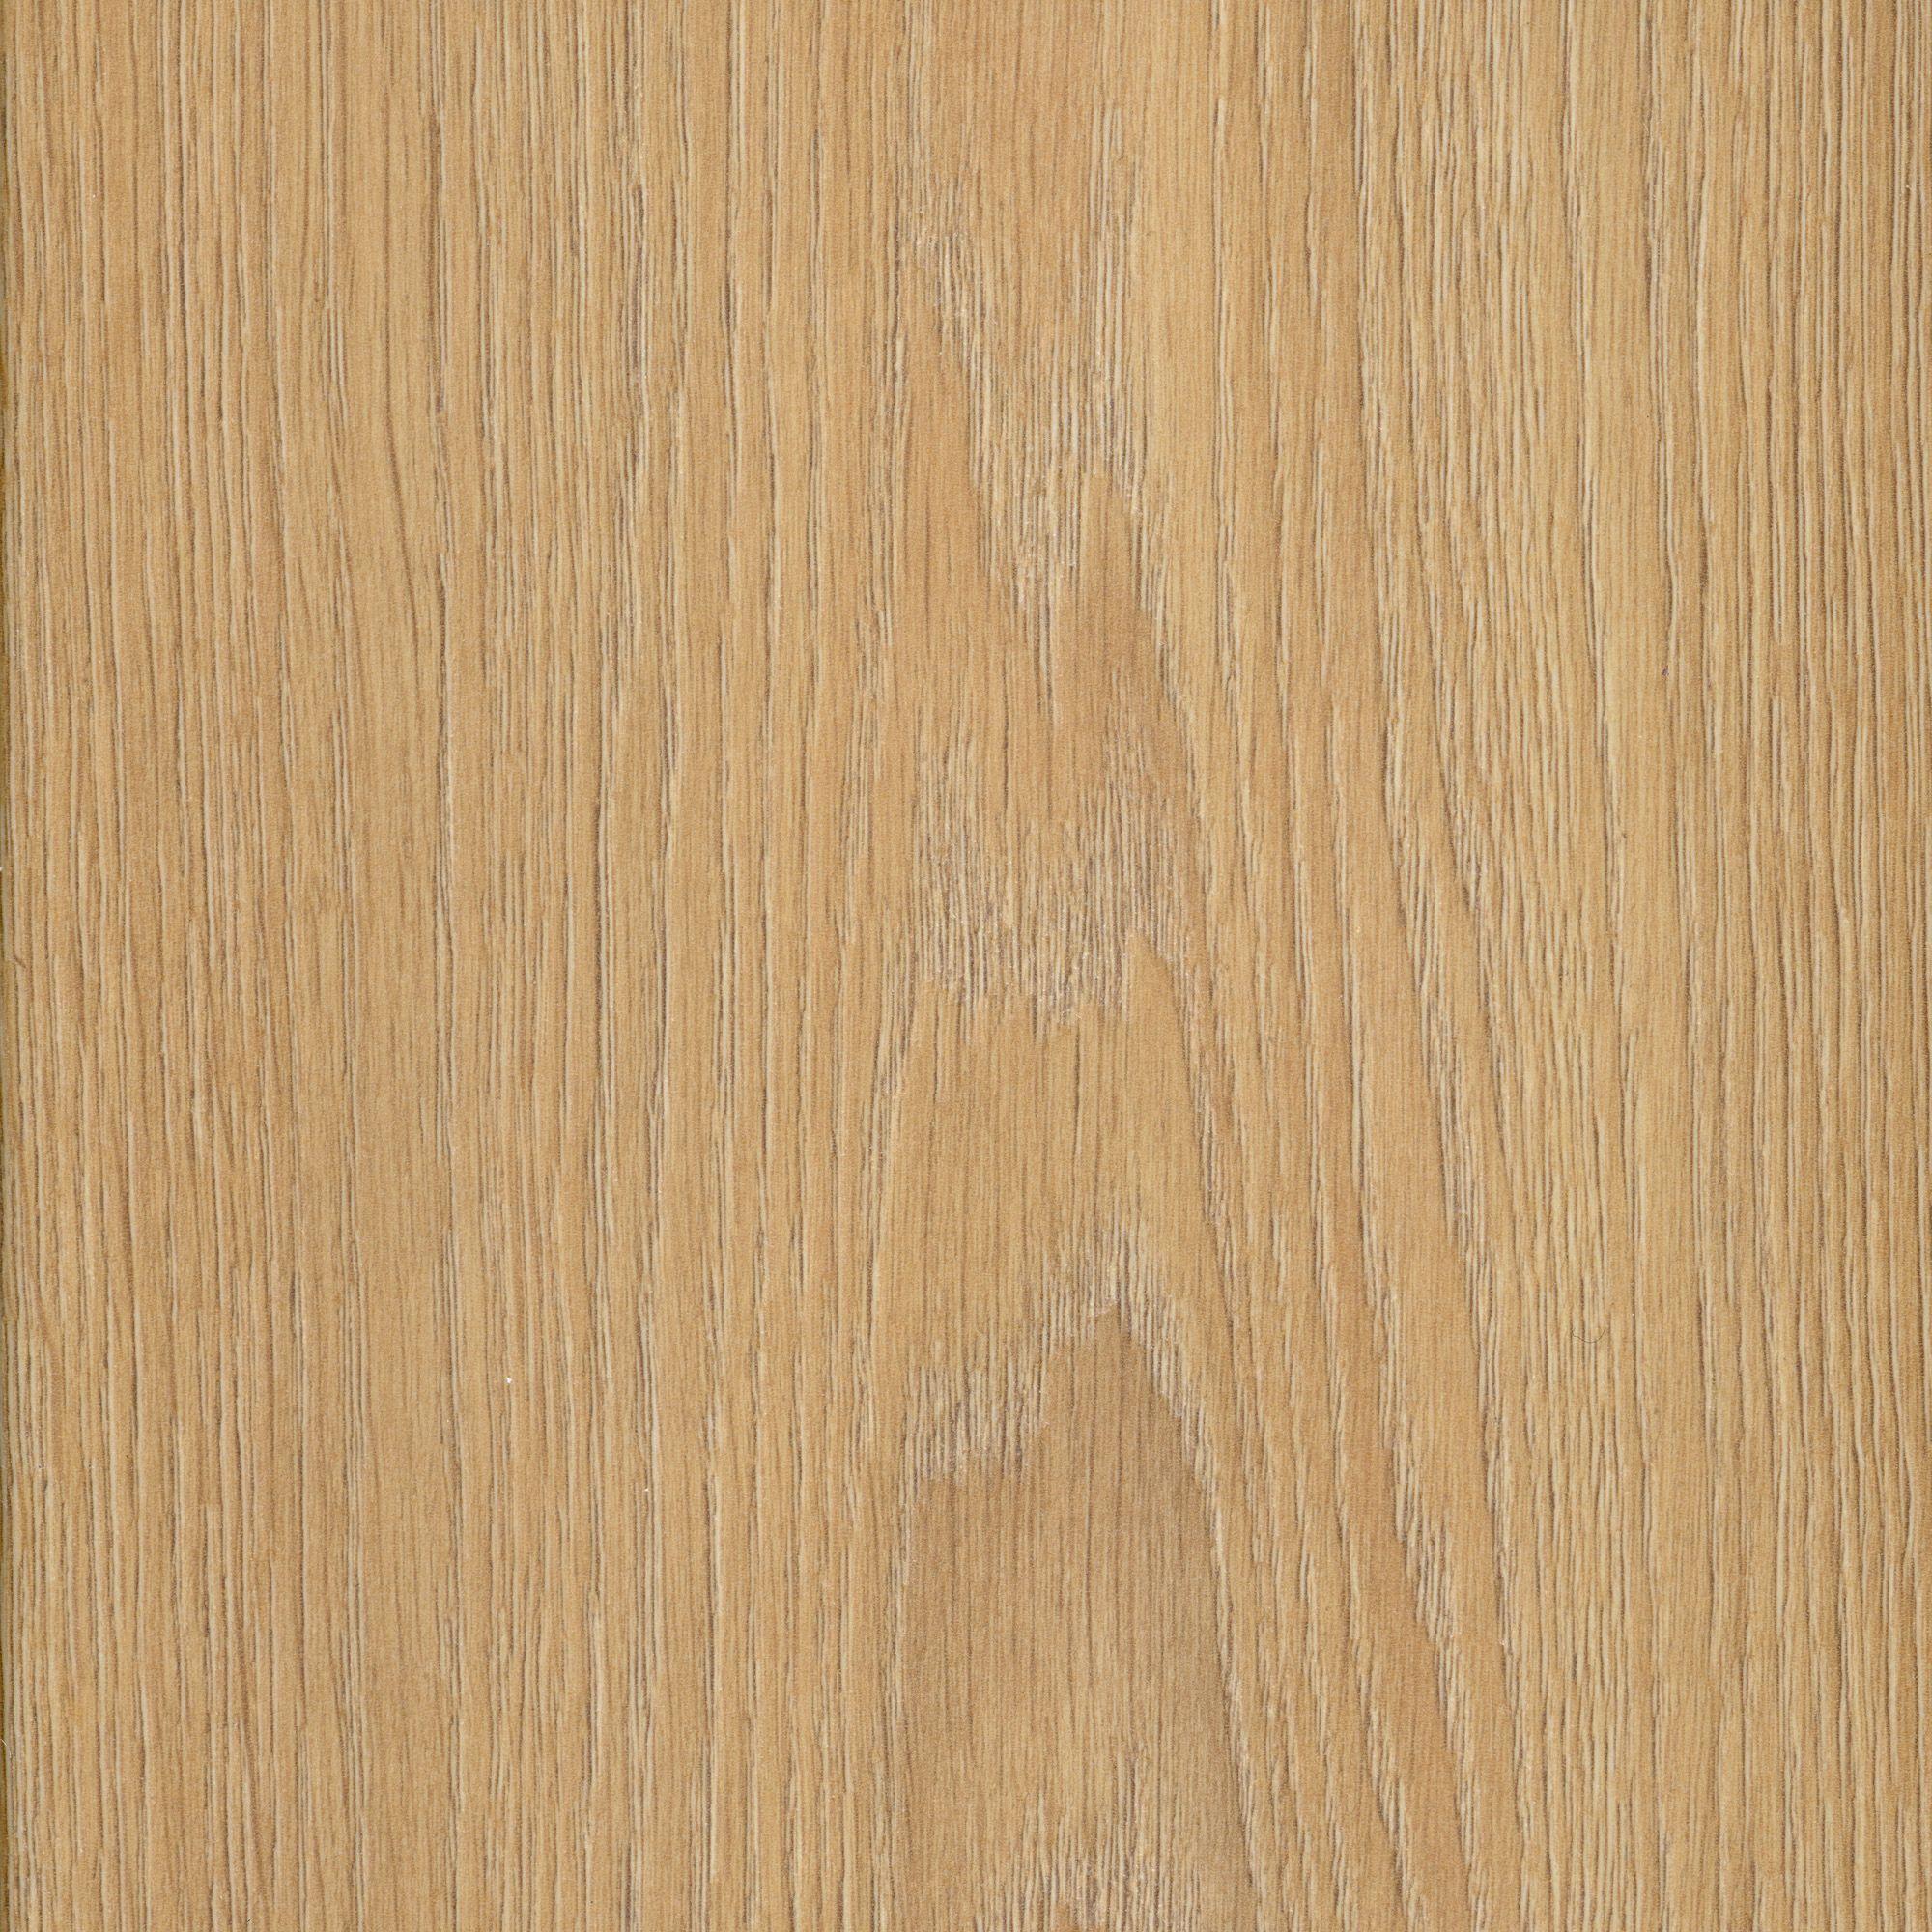 Alauda Light Oak Effect Laminate Flooring Sample ...